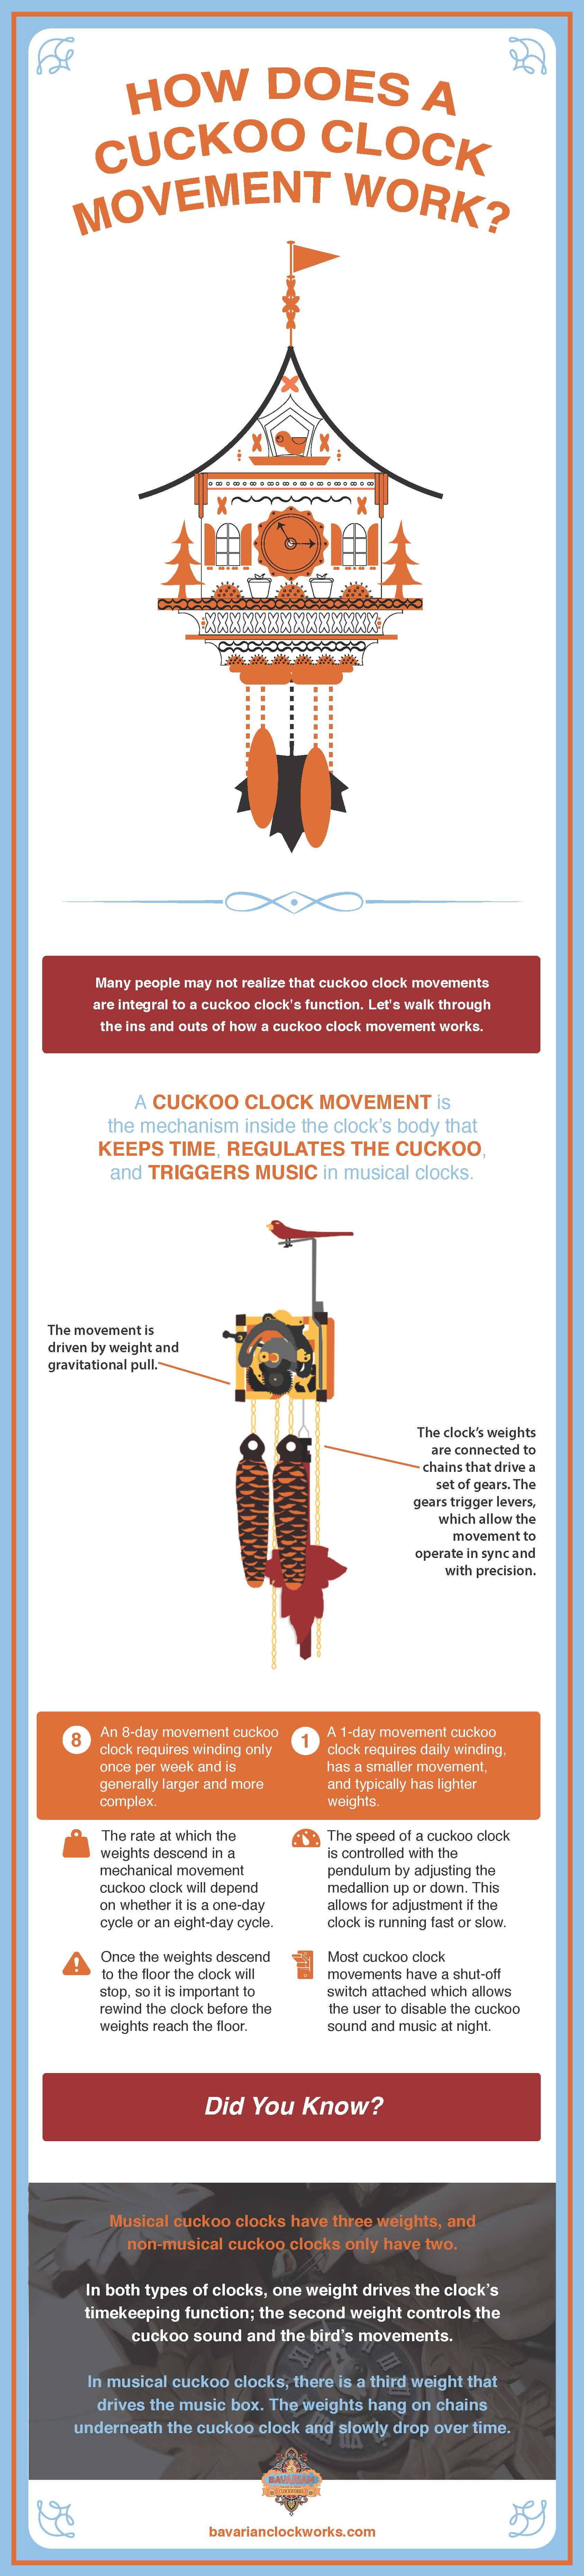 cuckoo-clock-infographic.jpg